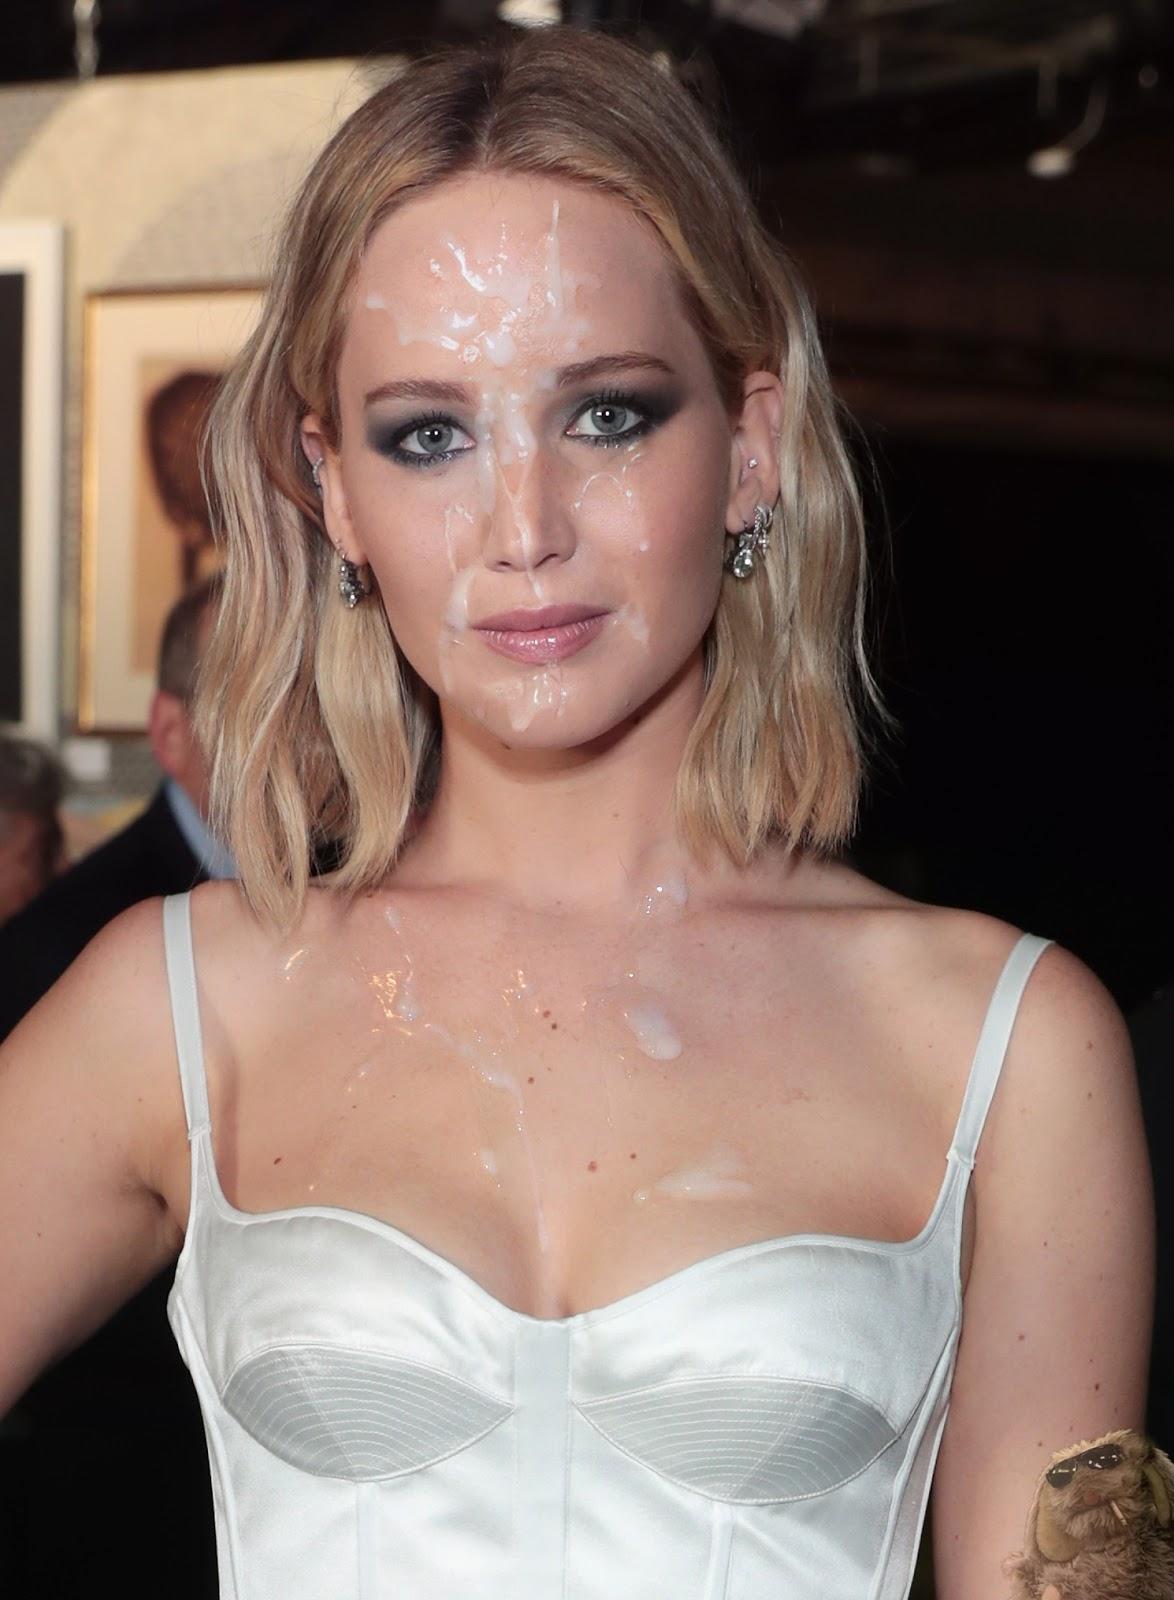 Jennifer Lawrence Facial Fake - Mr Floppy Fakes